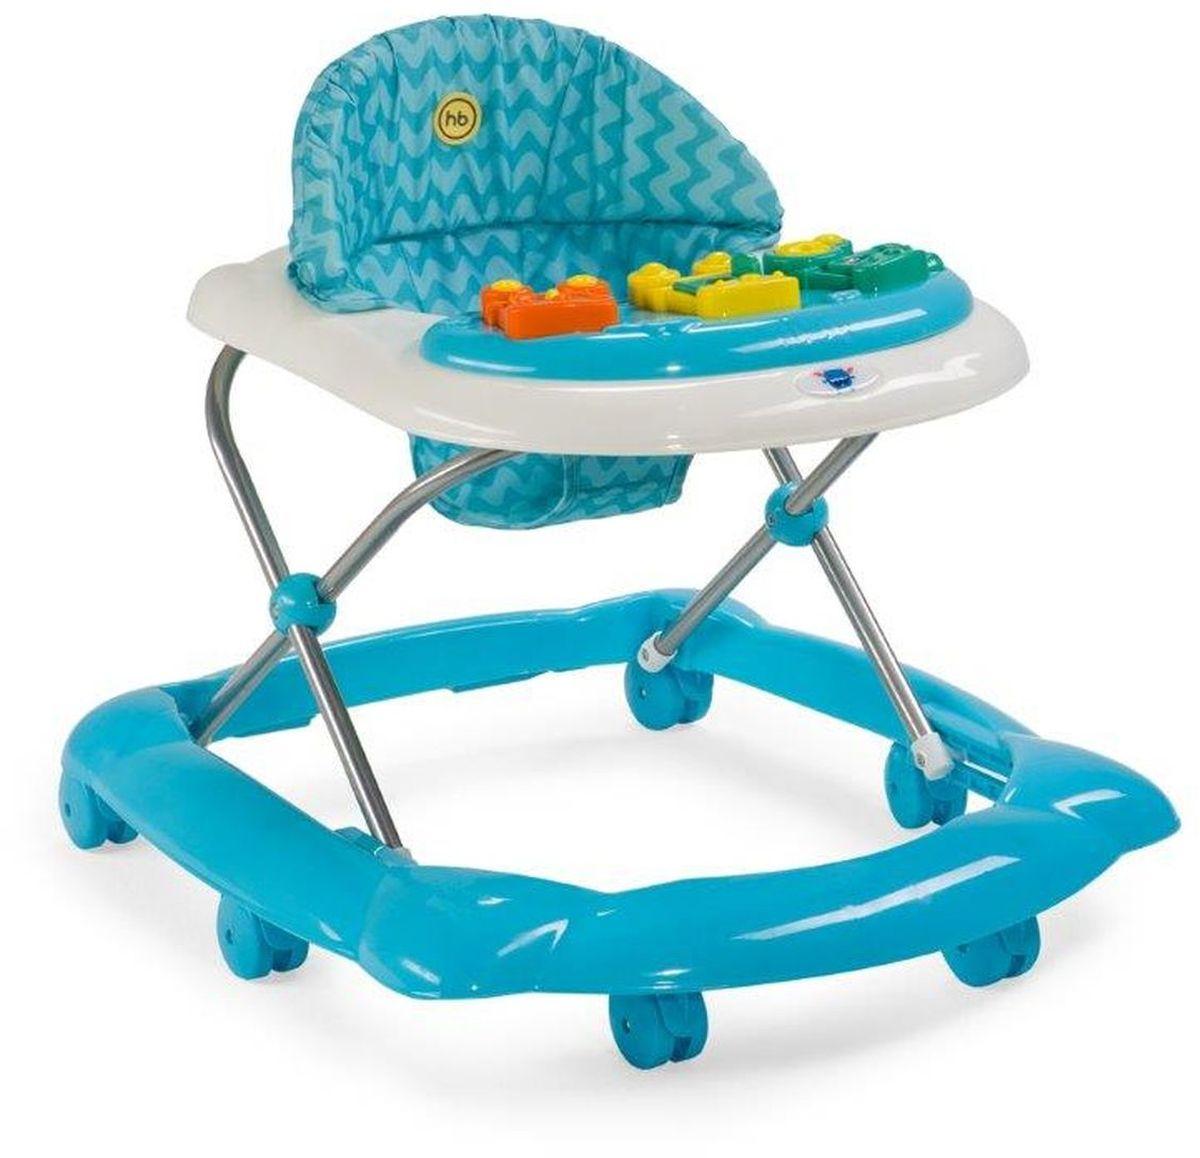 Happy Baby Ходунки Pioneer цвет голубой -  Ходунки, прыгунки, качалки